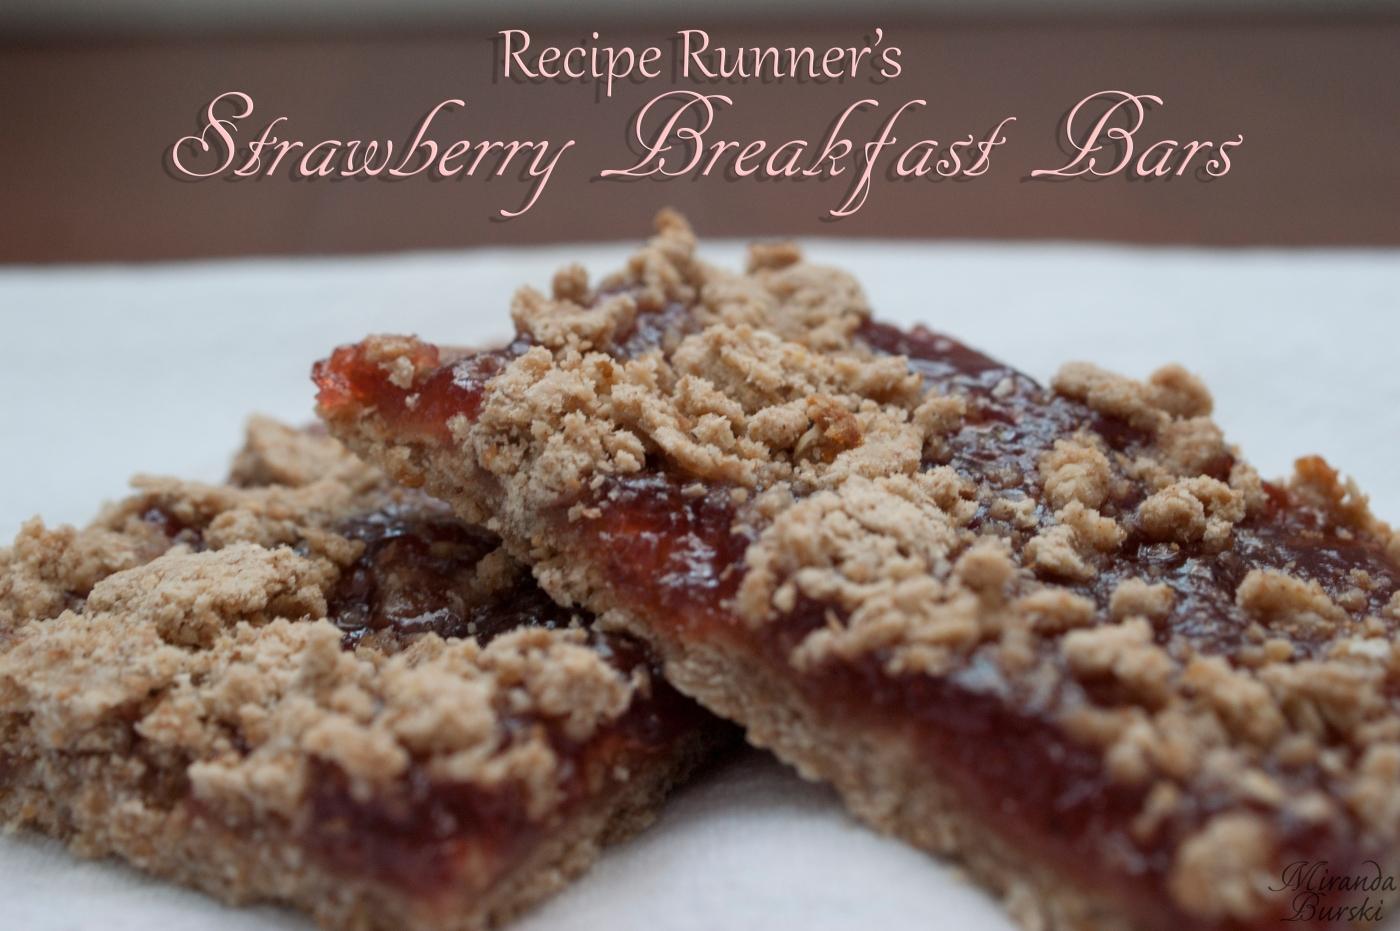 Recipe Runner's Strawberry Breakfast Bars